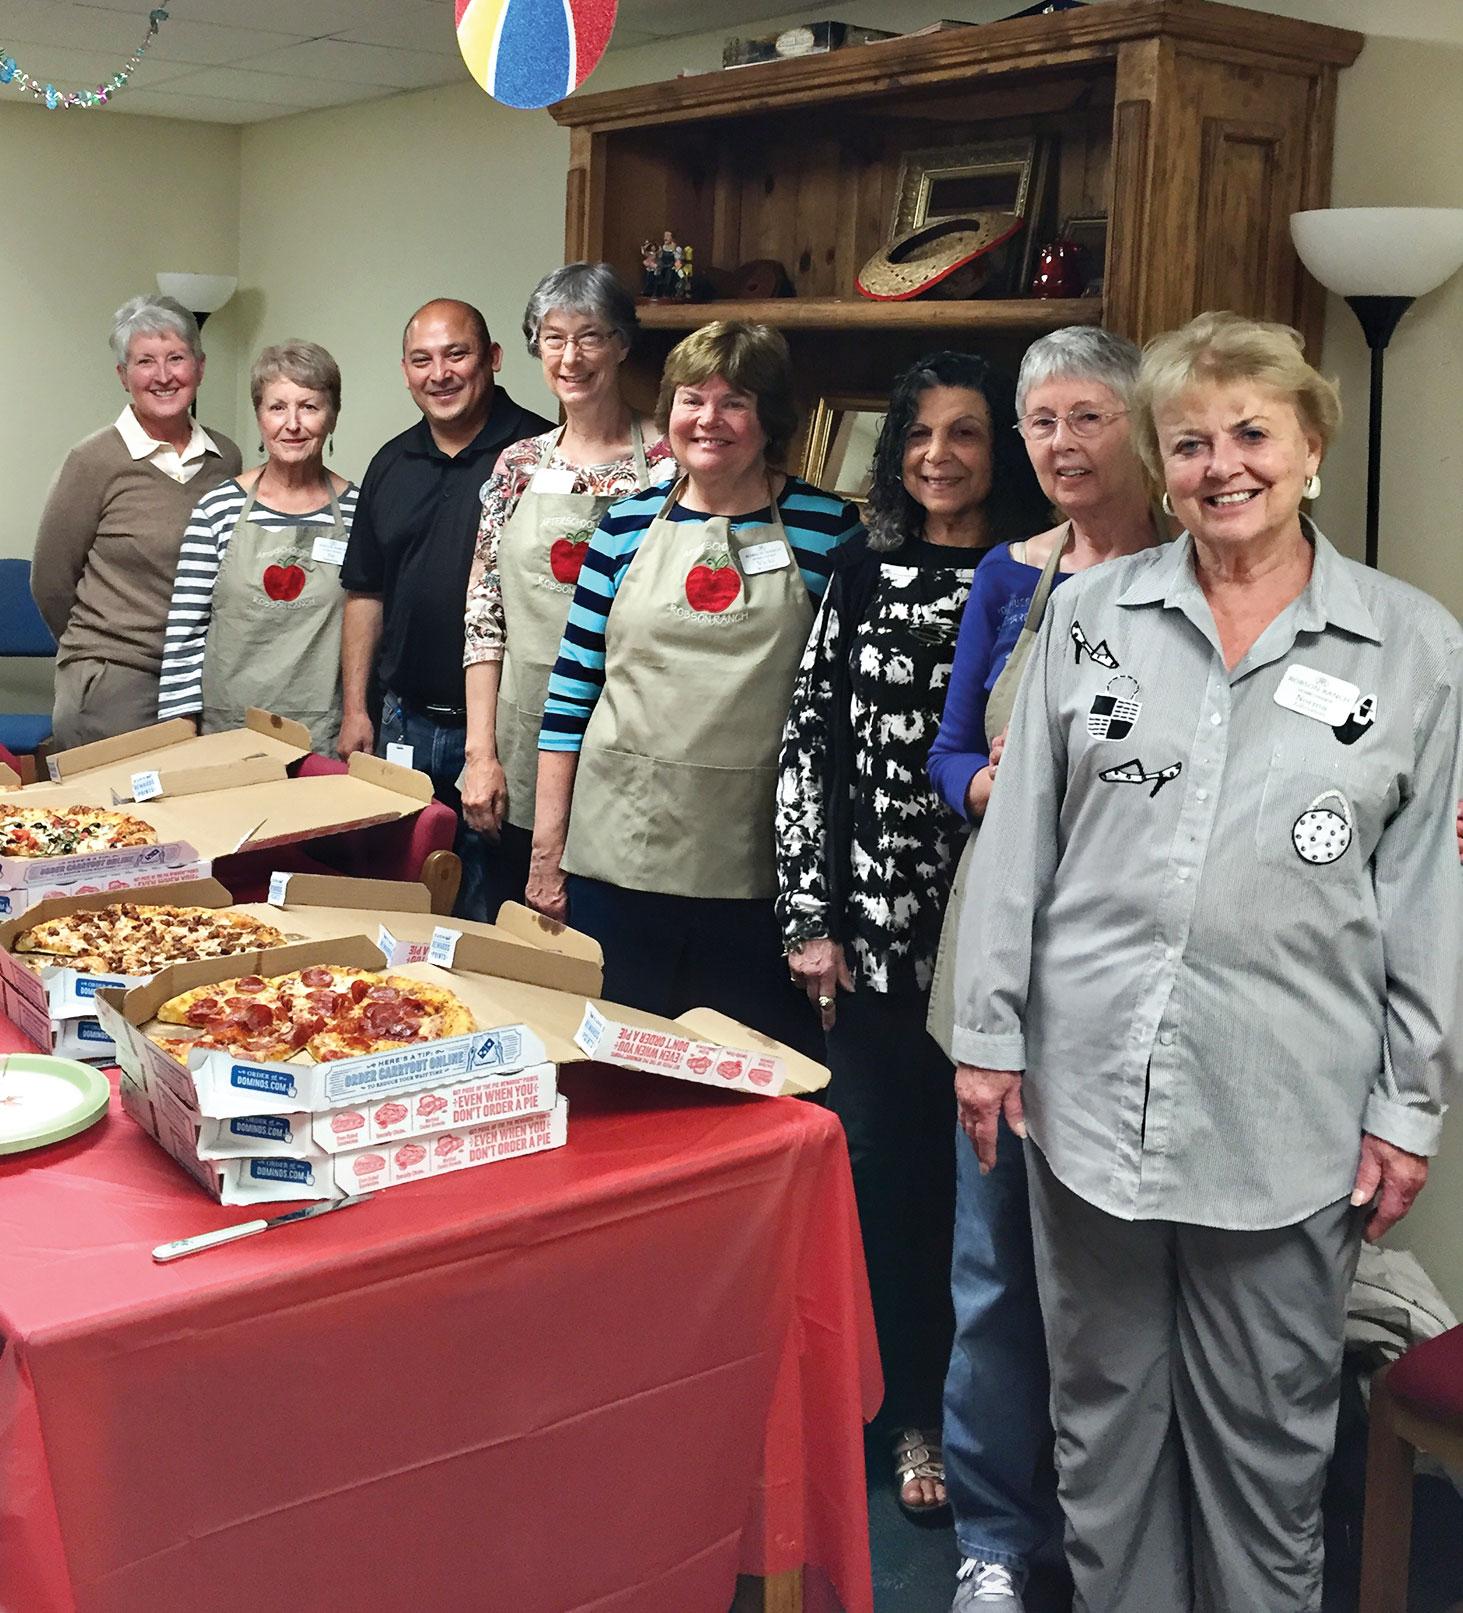 Lavelle Carlson, Pat Hamblin, Principal Richard Gonzales, Cathy Harden, Vicki Williams, Sue Cousin, Helen Allen and Norma Johnston